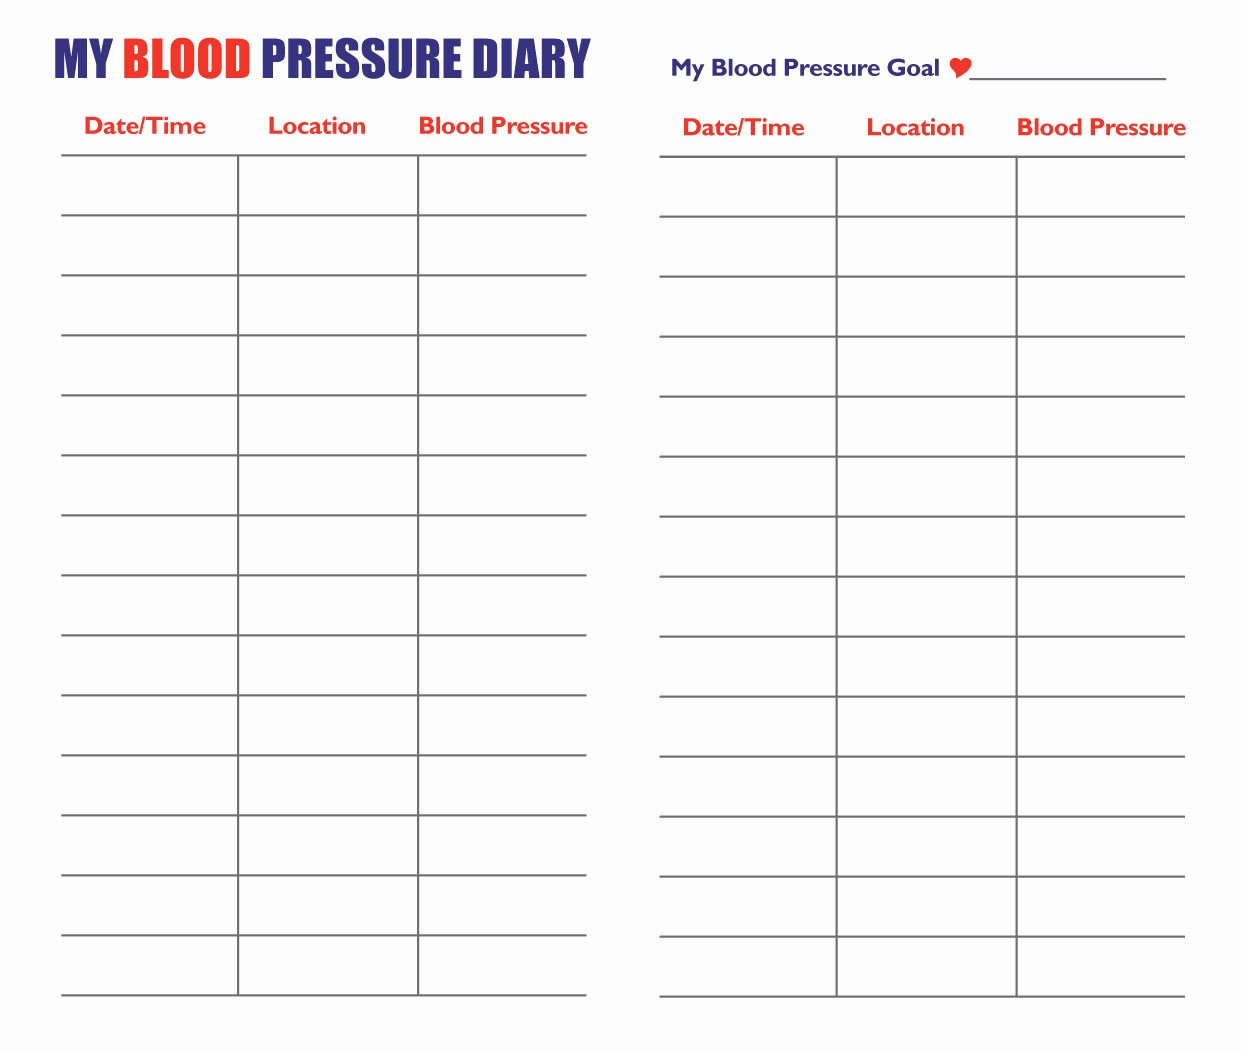 Blood Pressure Log Print Out New 2015 Blood Pressure Monitoring Chart